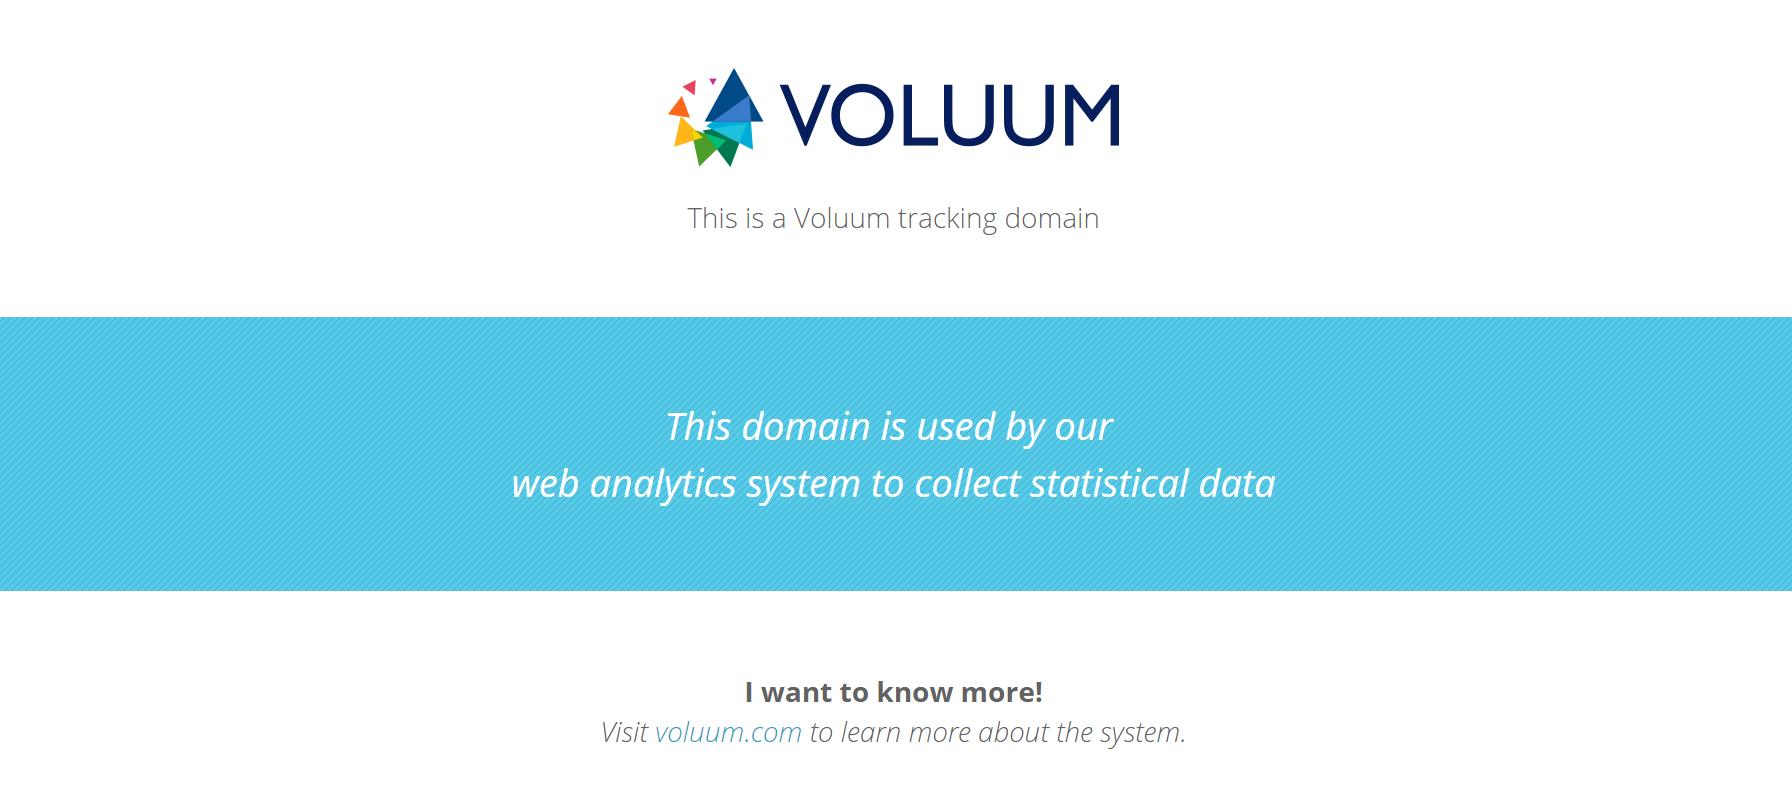 ads by Voluumtrk.com